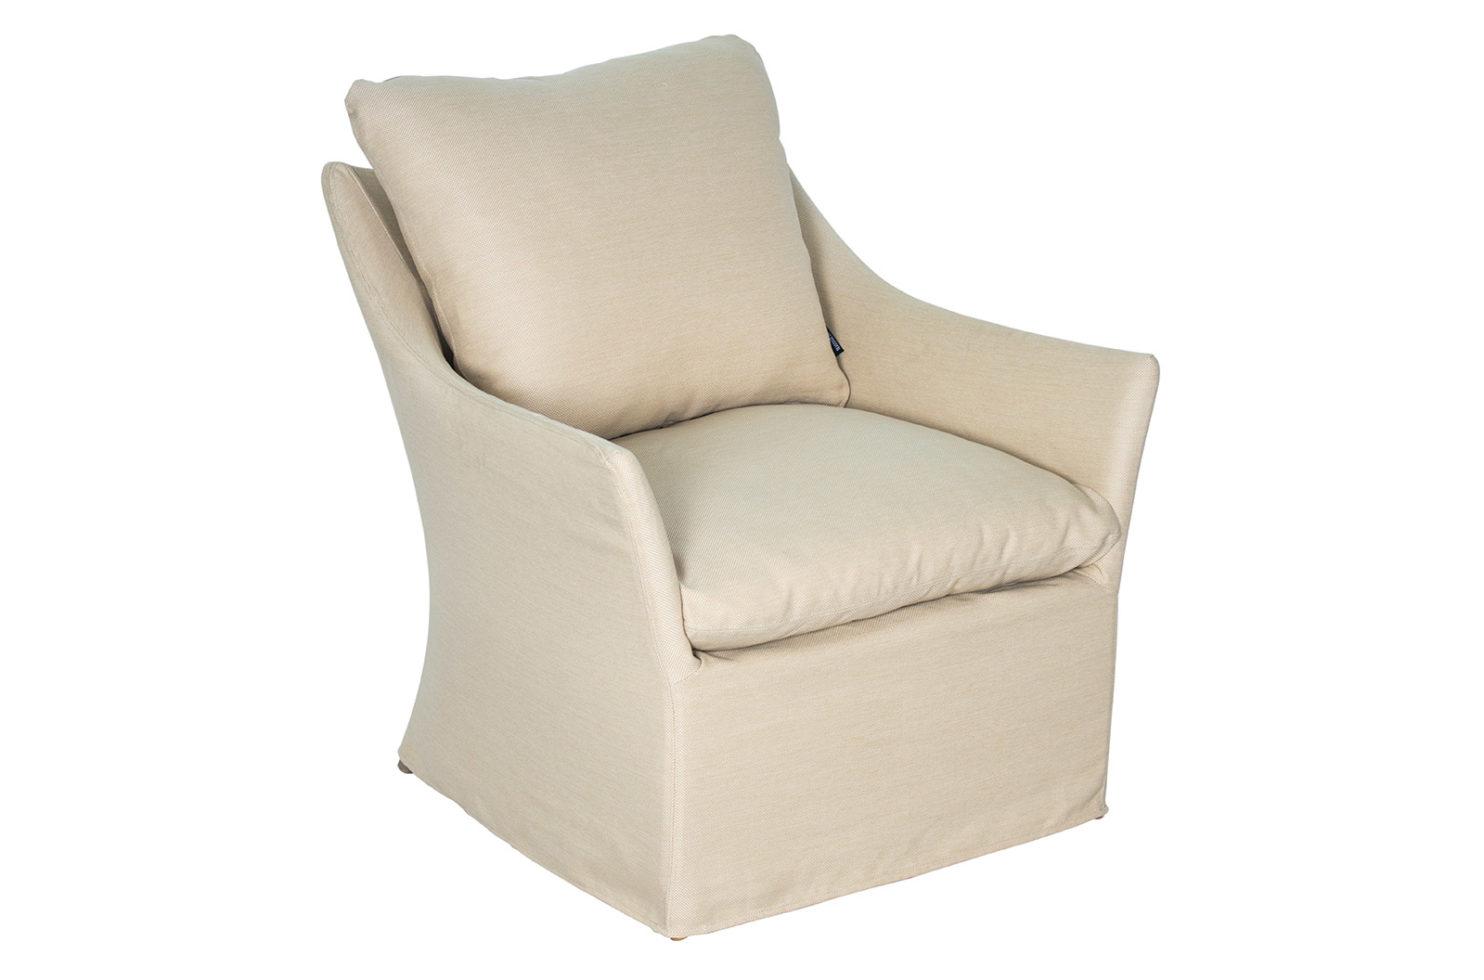 capri lounge 620FT091FC PW 1 3Q